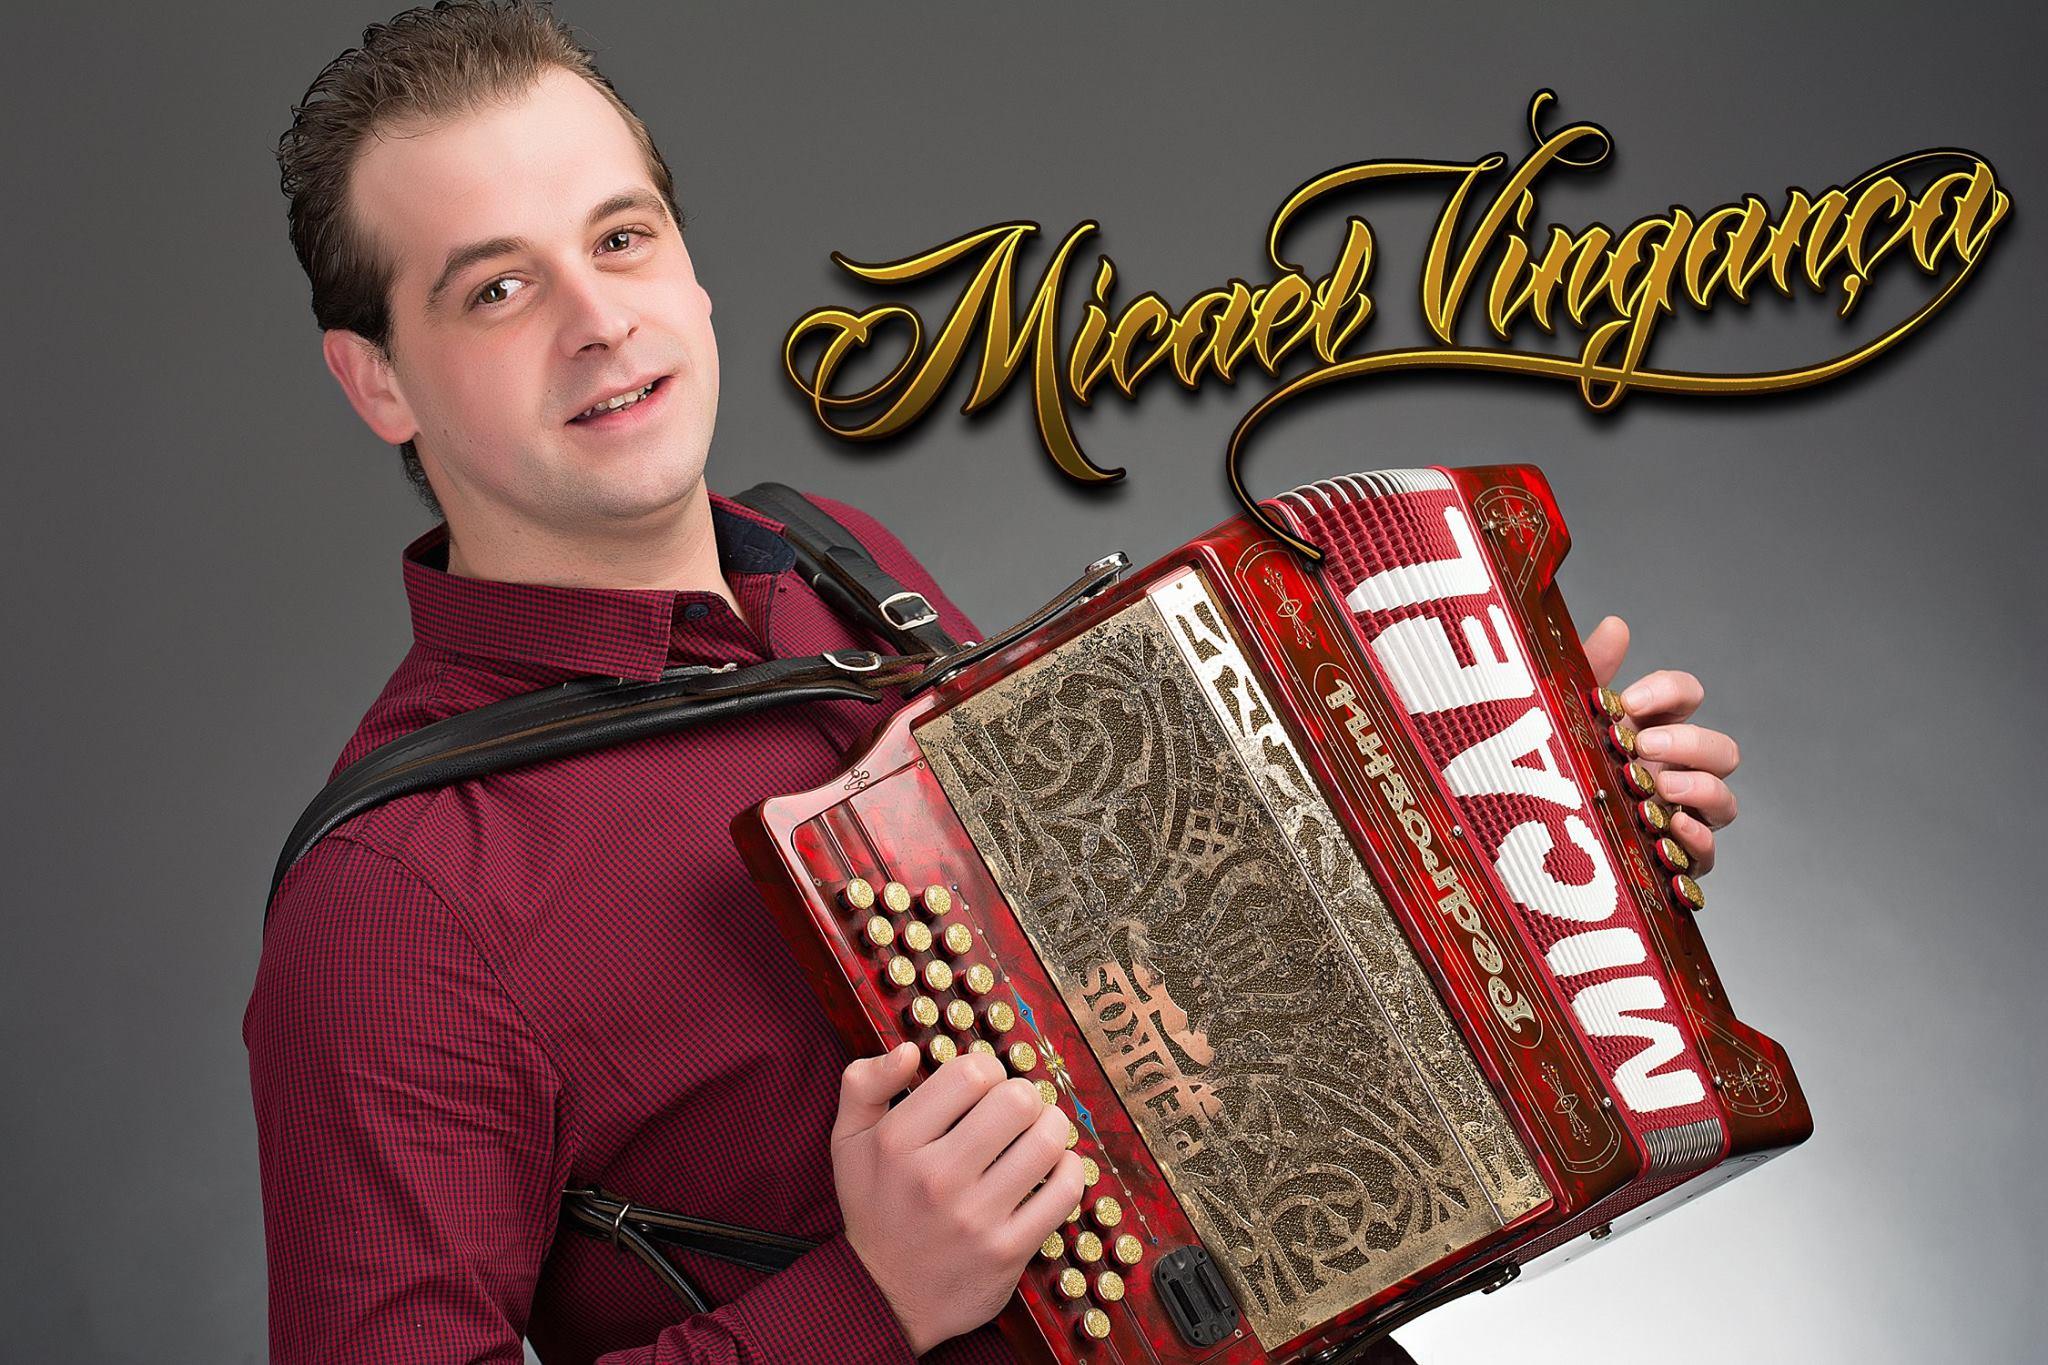 https://i1.wp.com/artmusic.pt/wp-content/uploads/2018/05/Micael-Vingança-Artmusic-Musica-1.jpg?fit=2048%2C1365&ssl=1